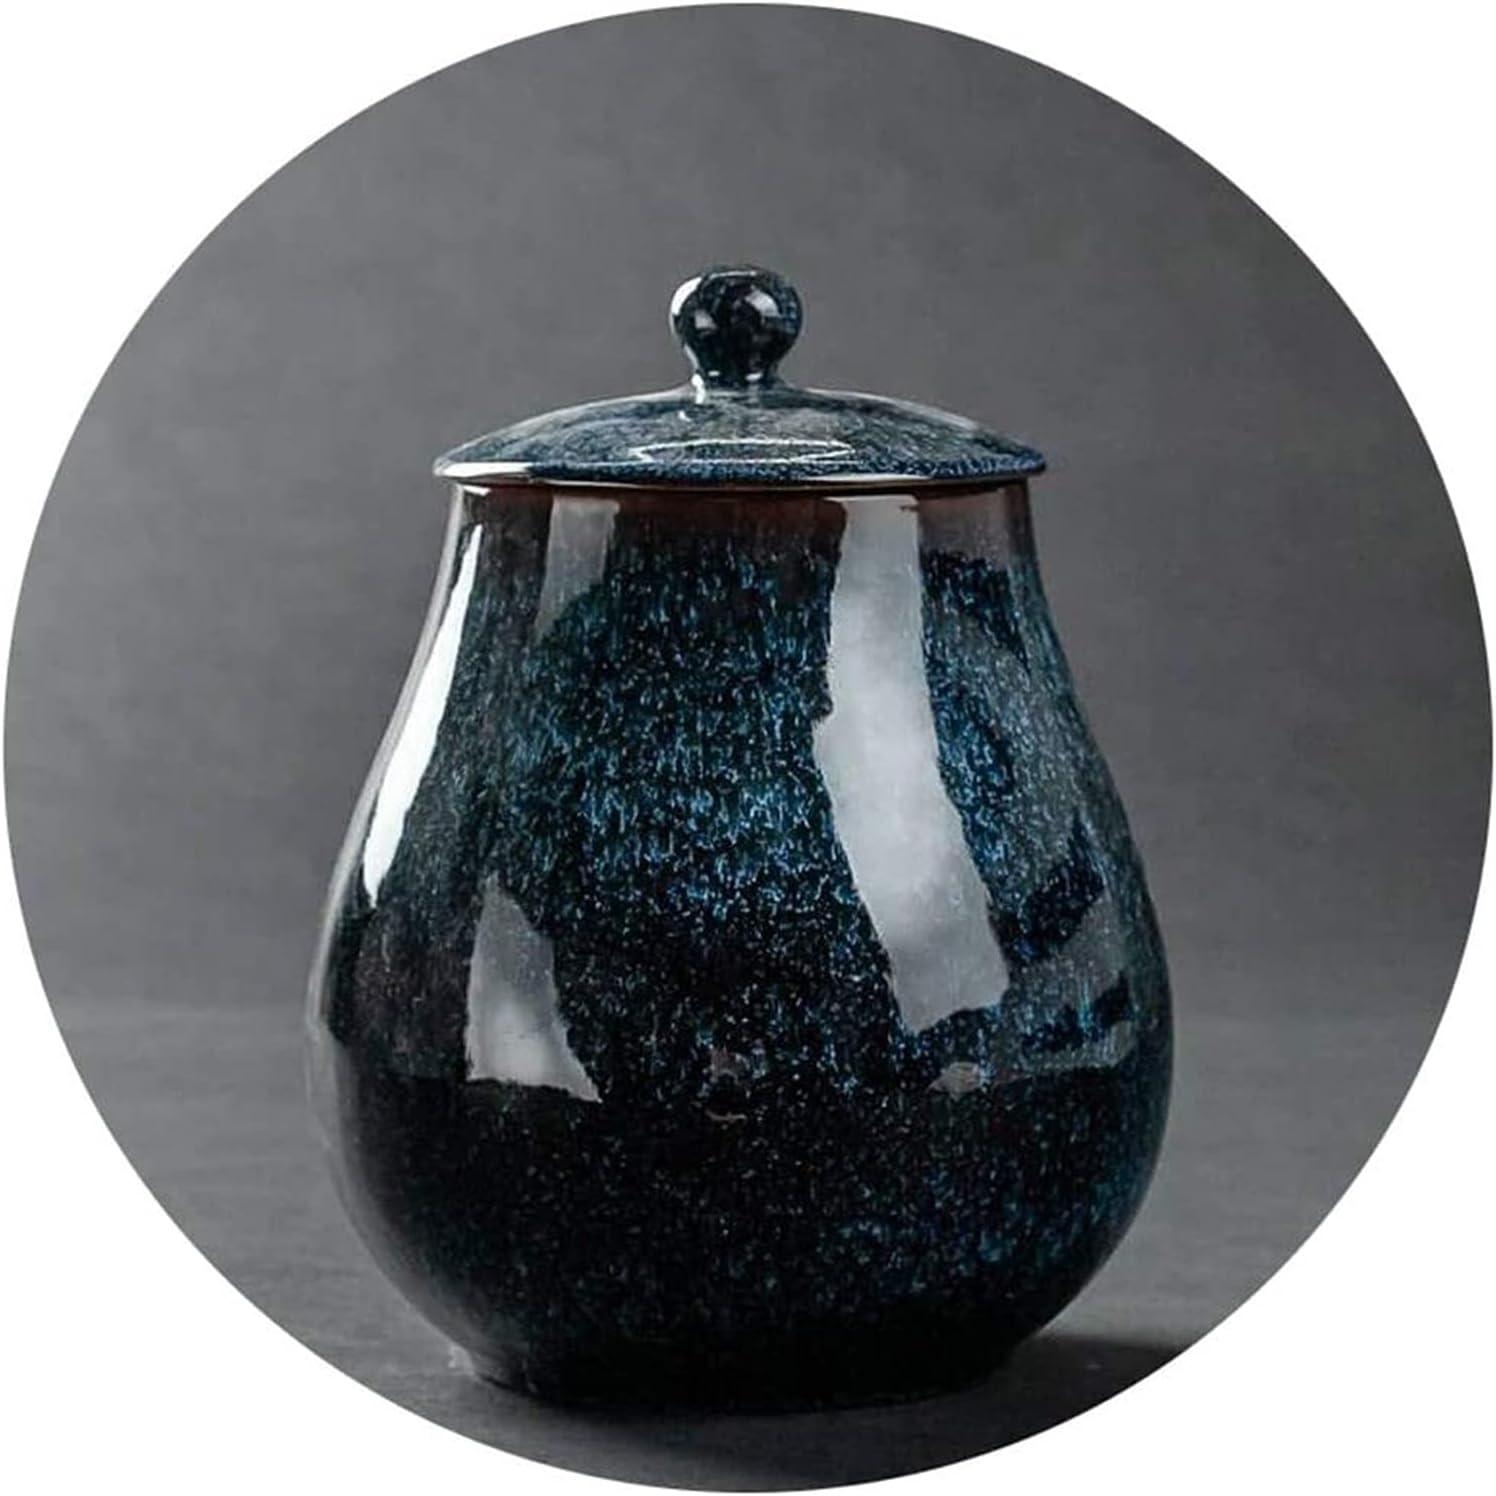 MTFZD Funeral Urn Cremation Urns Max 58% OFF Human Max 90% OFF Ceramic Big Sta Adult